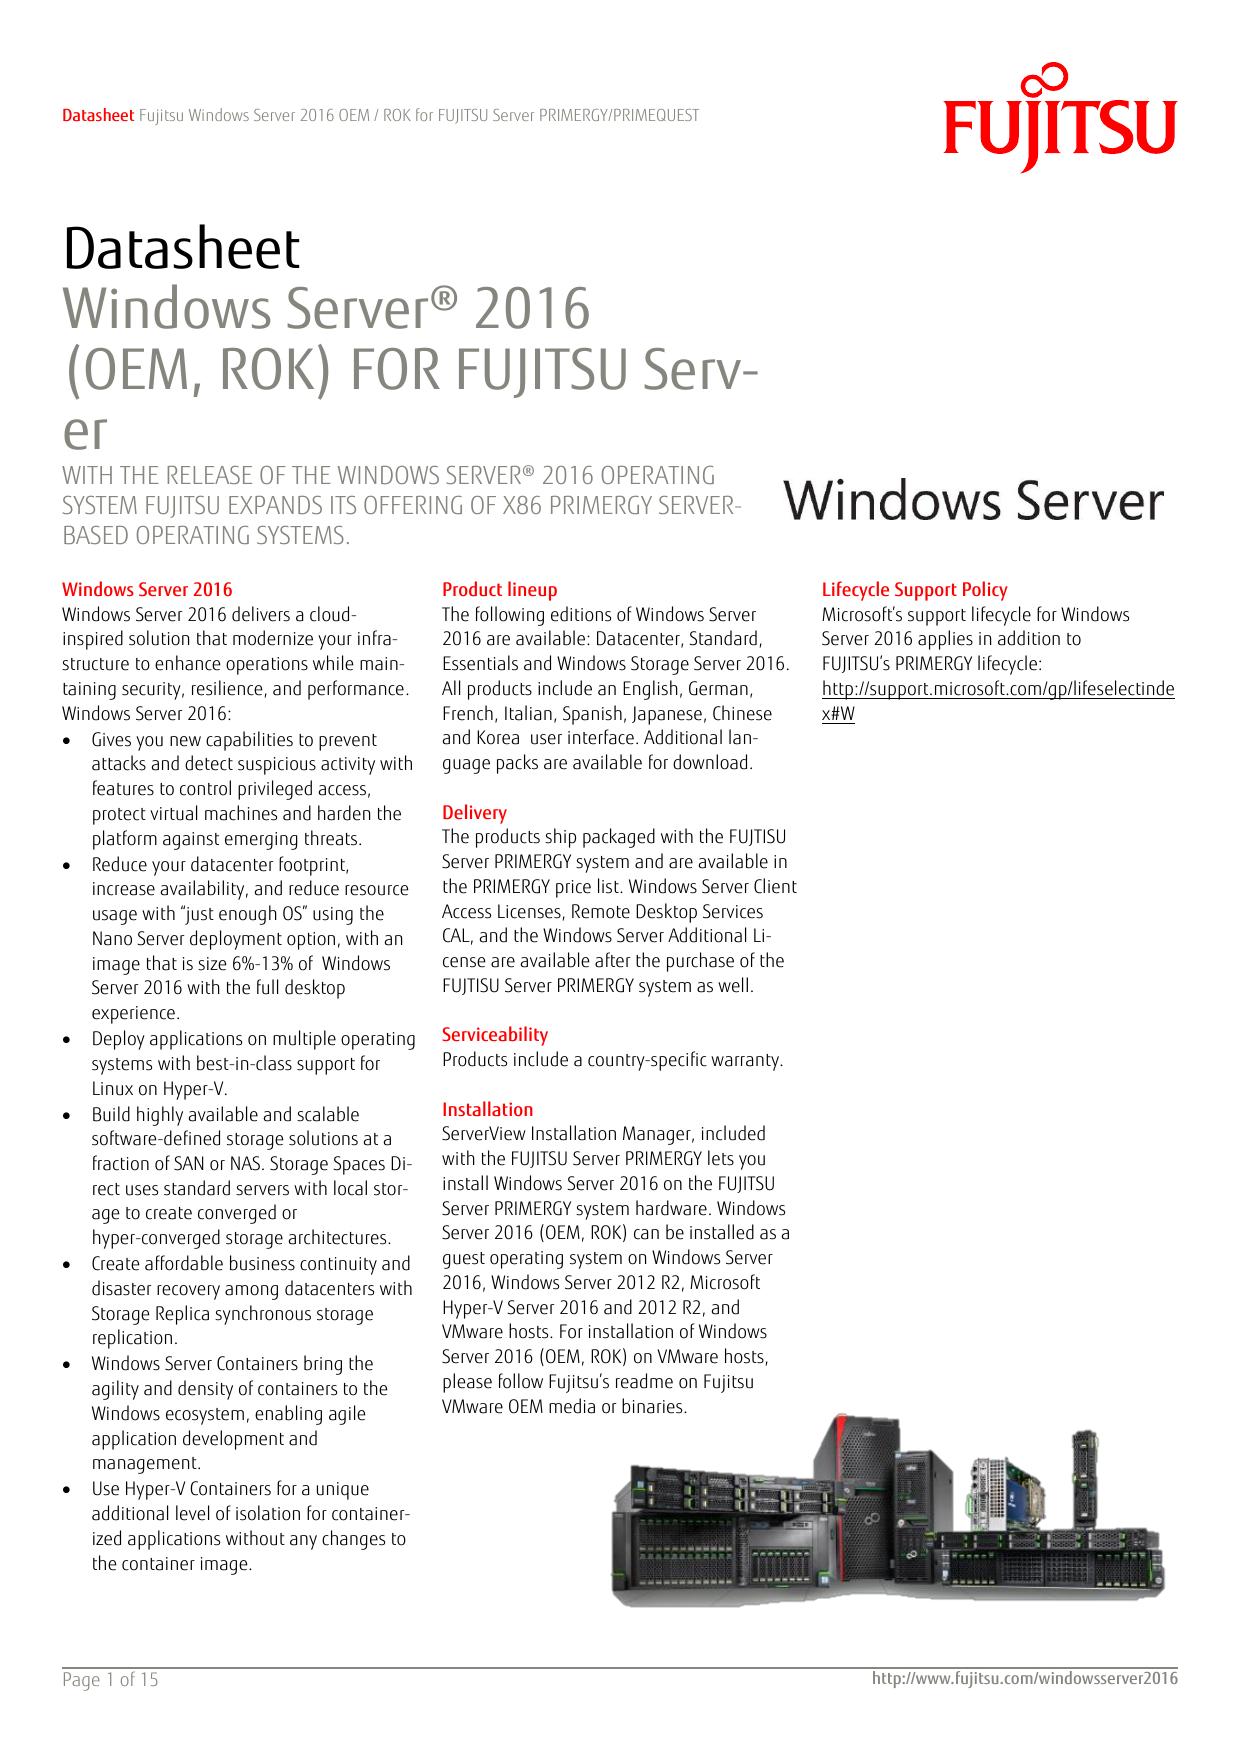 windows server 2012 r2 foundation iso download fujitsu